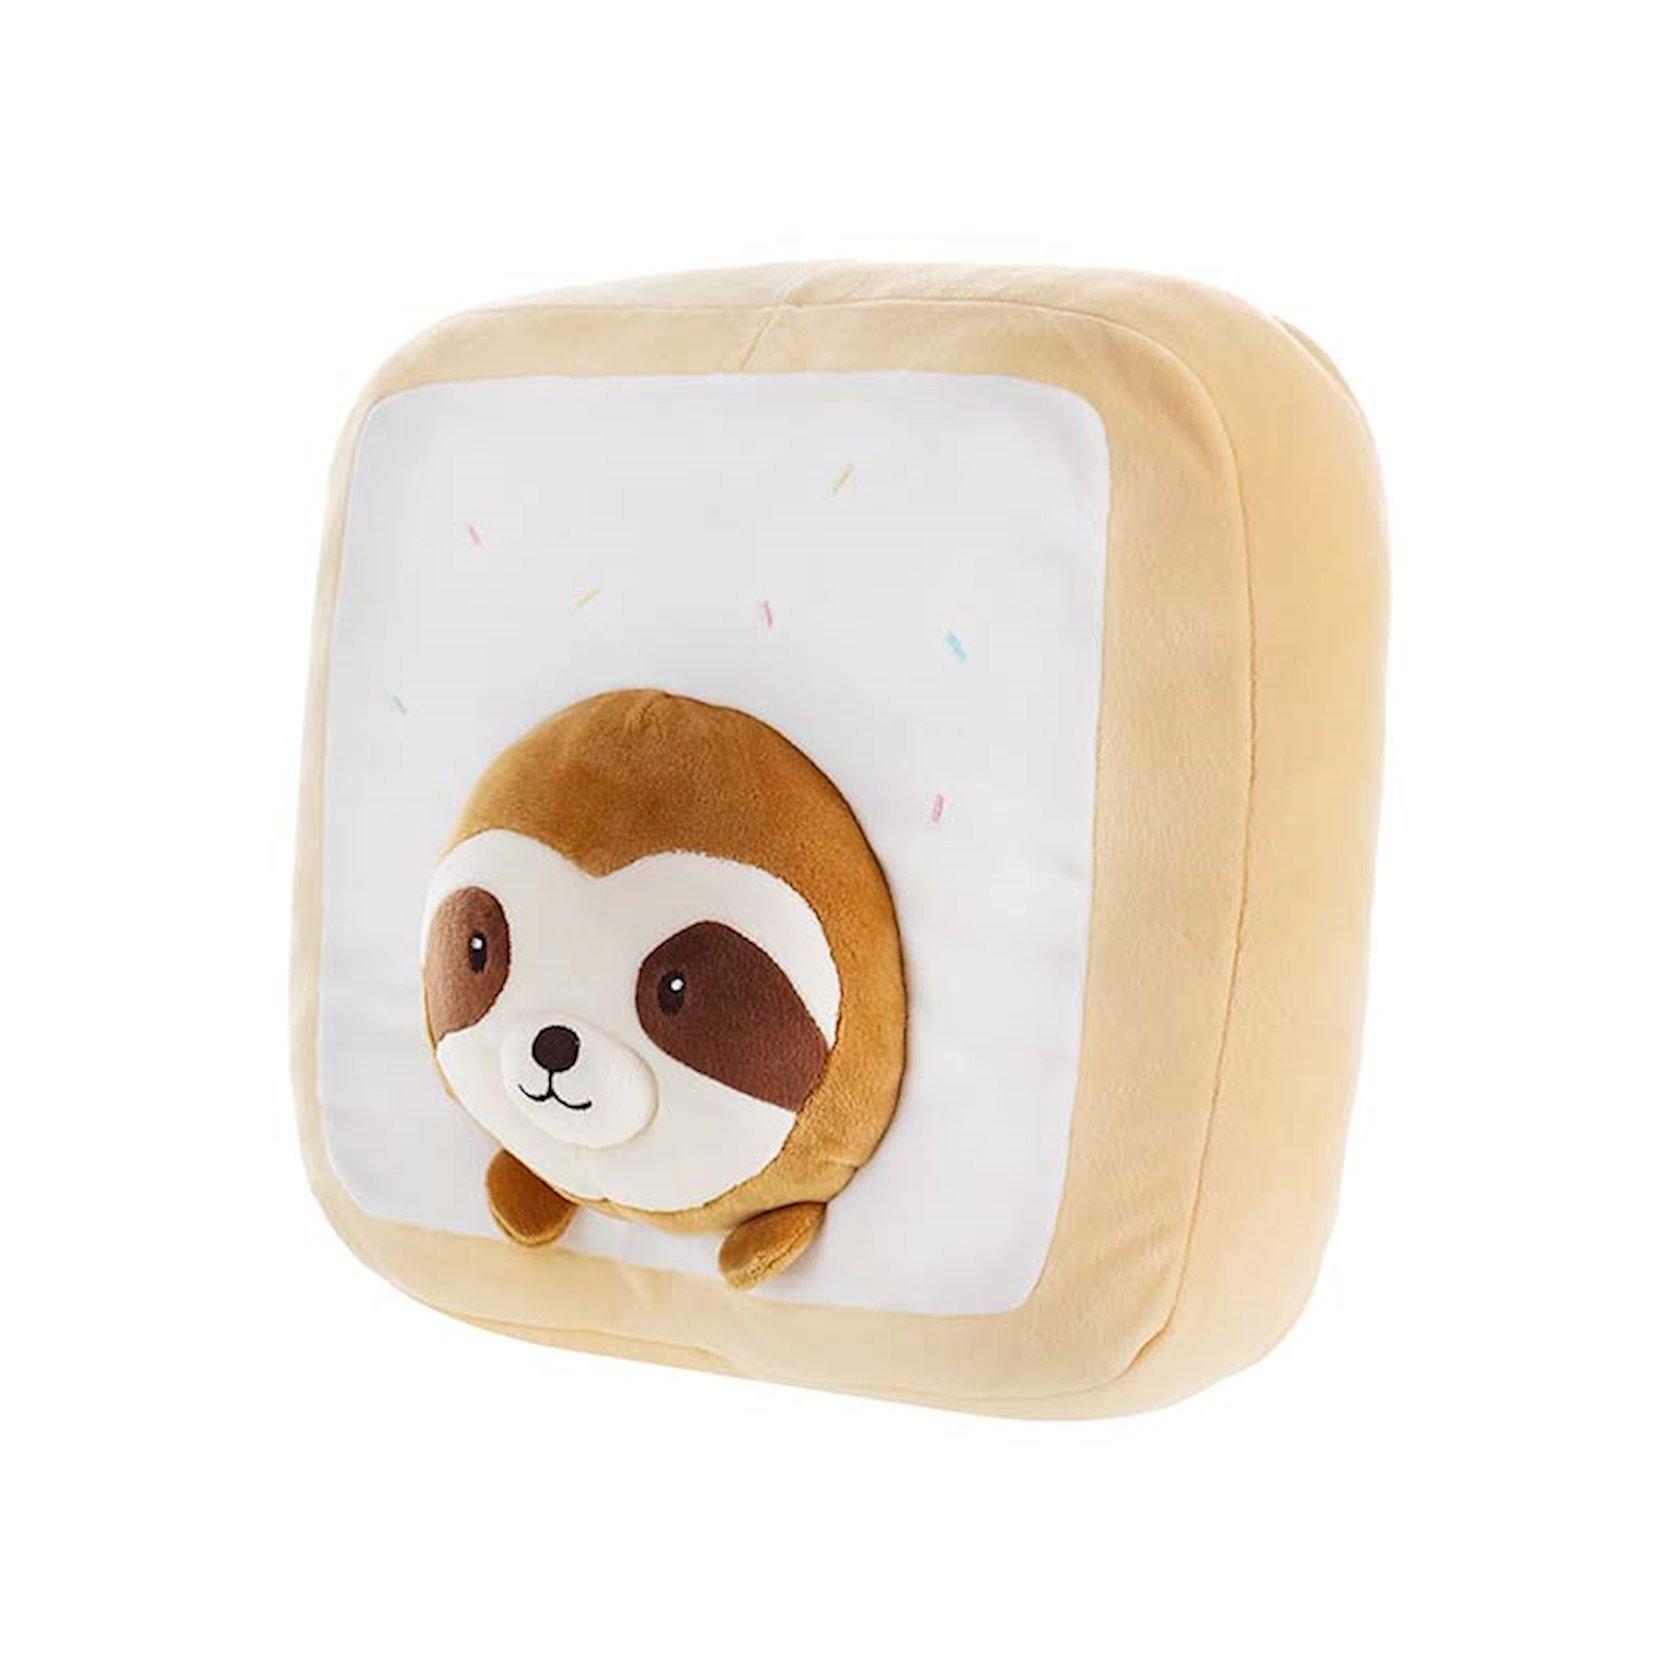 Yastıq Miniso Toast Sloth